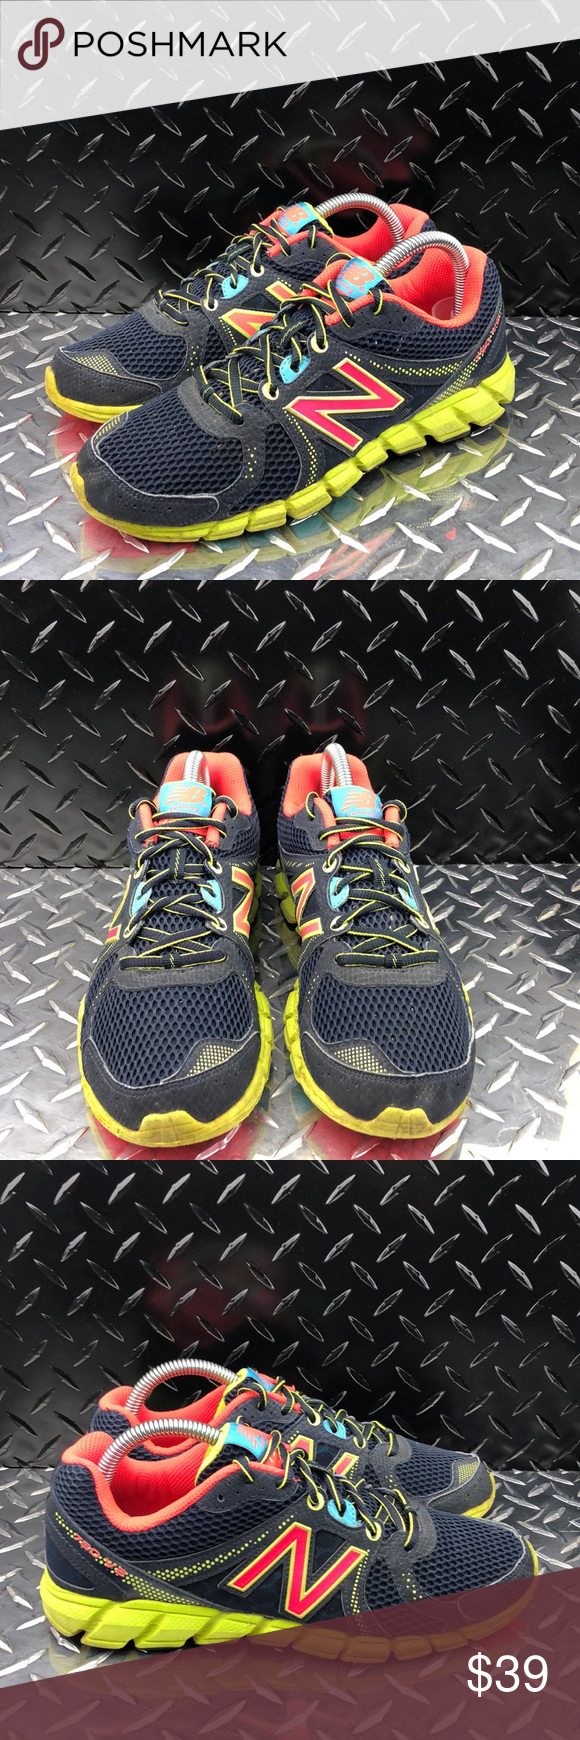 New Balance 750 V2 | New balance shoes